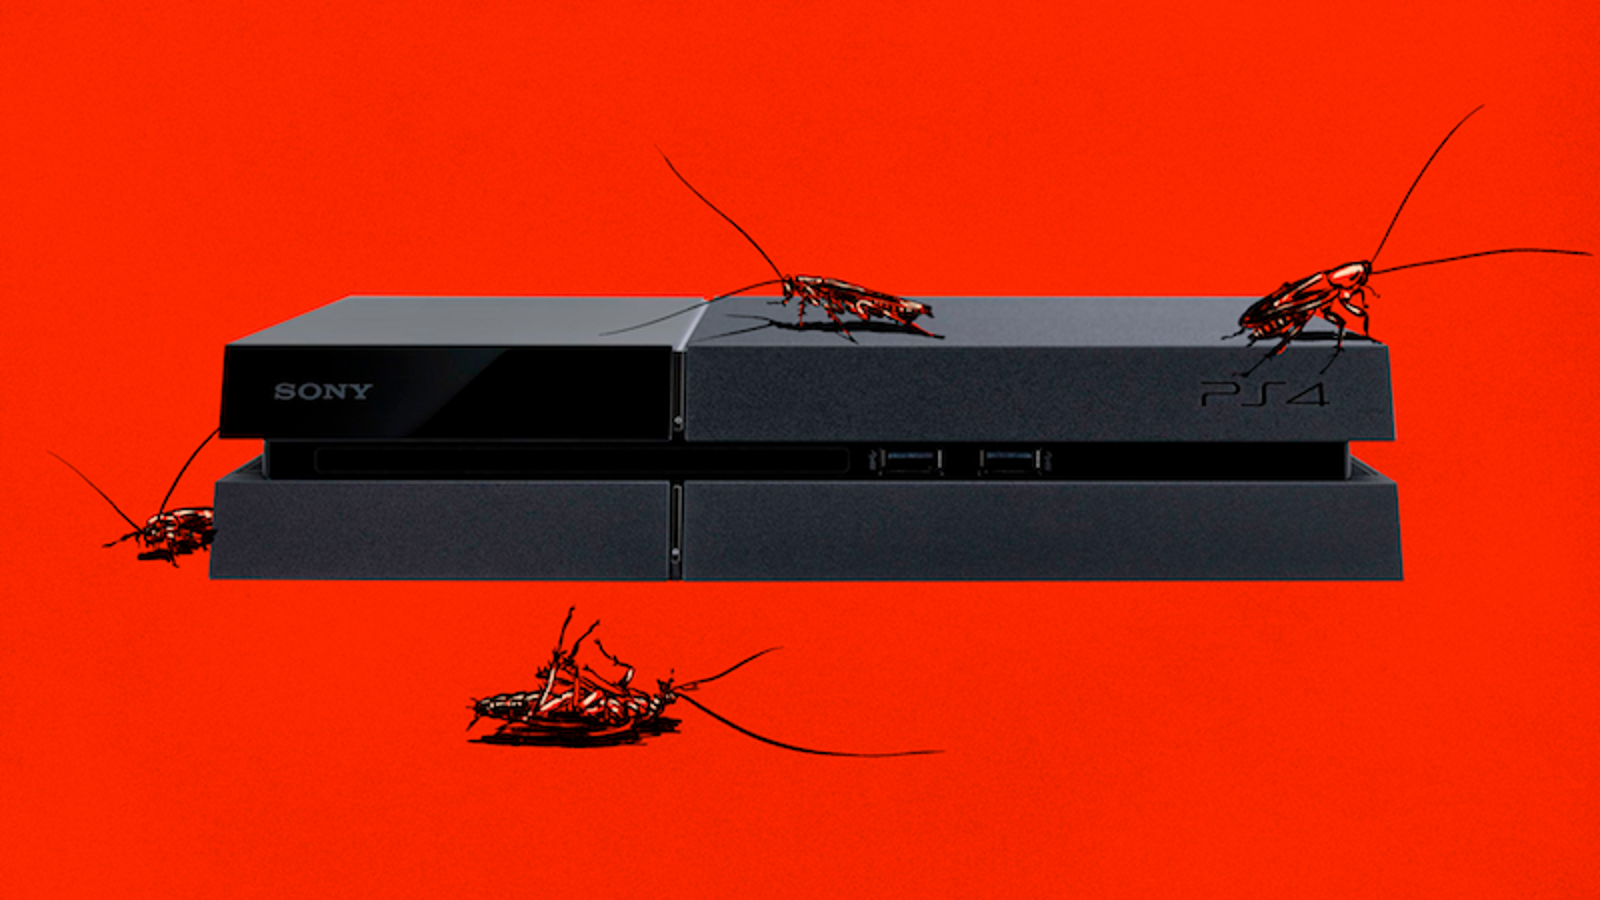 Console Repairmen Explain Why Cockroaches Love PS4s